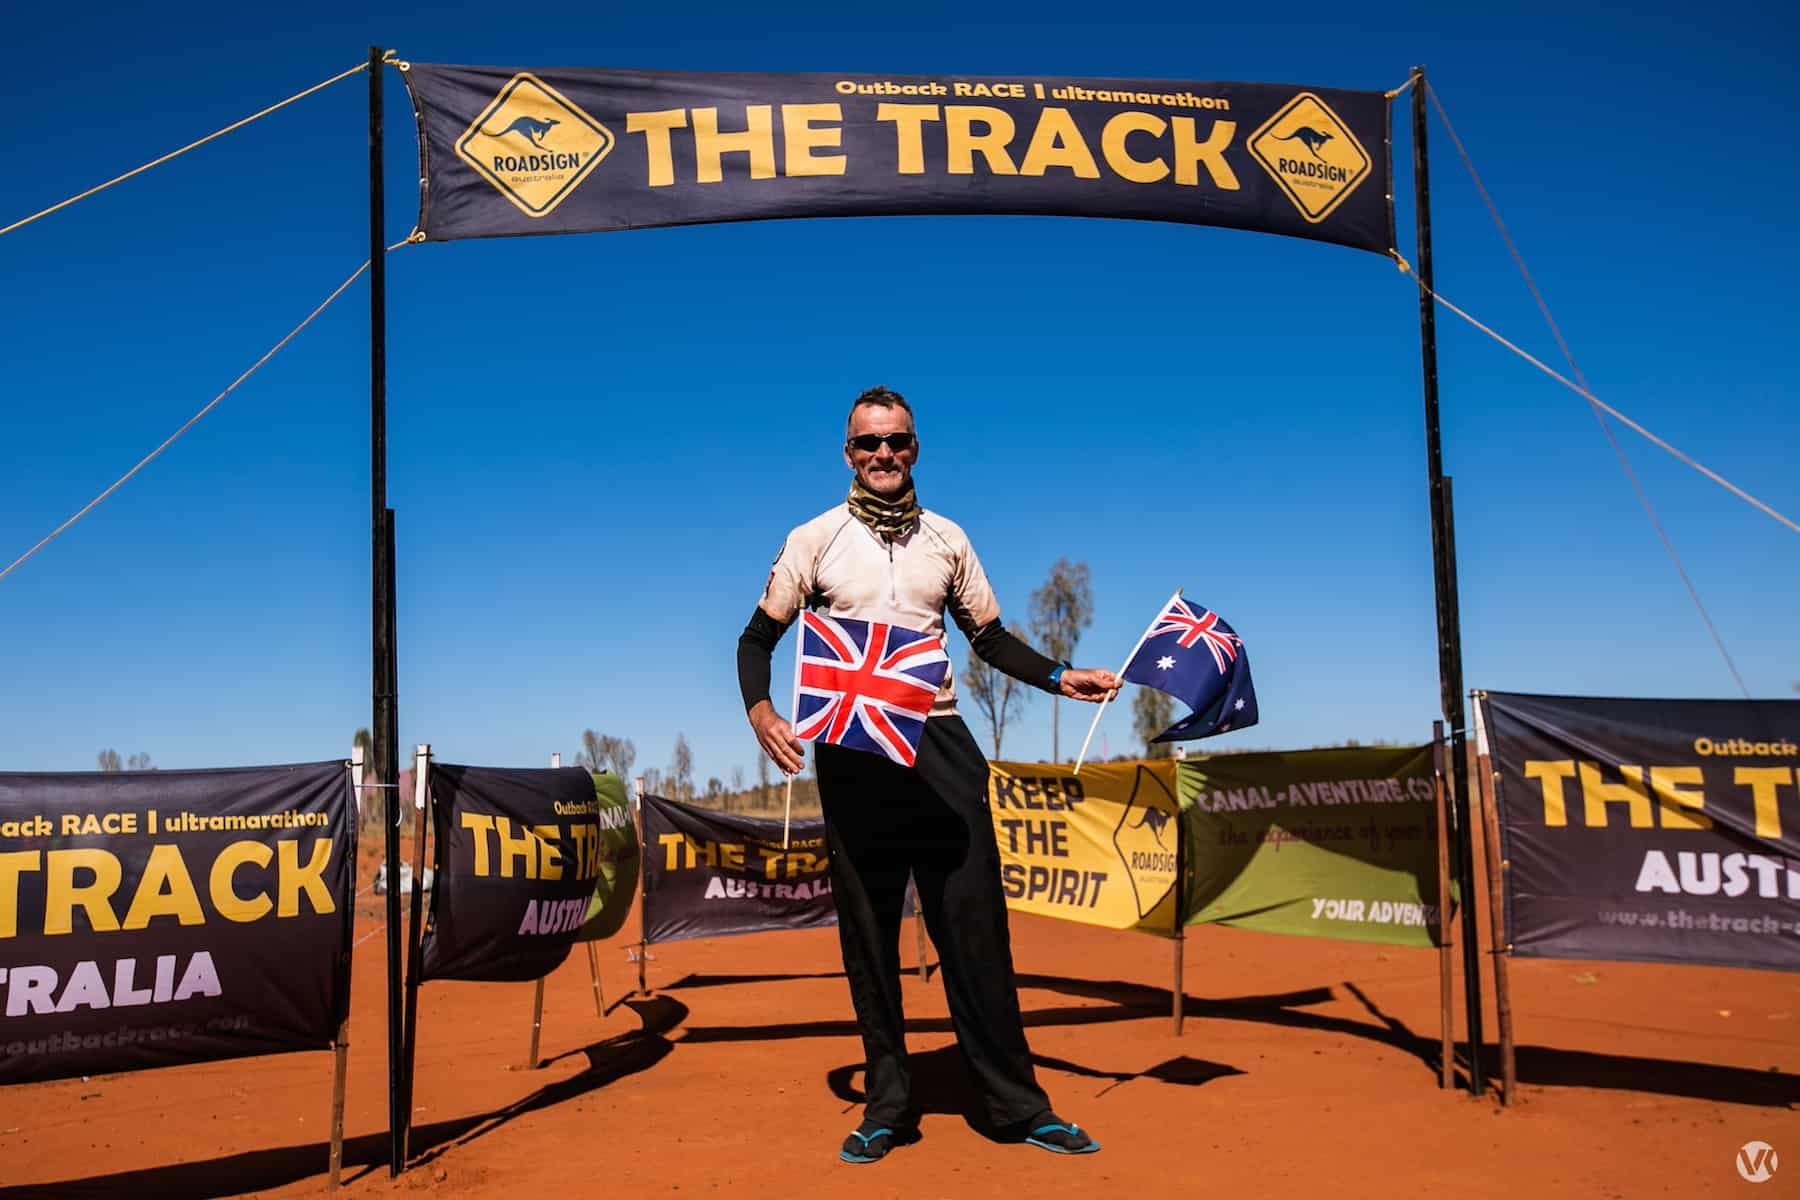 David Taylor (UK) - THE TRACK 2015